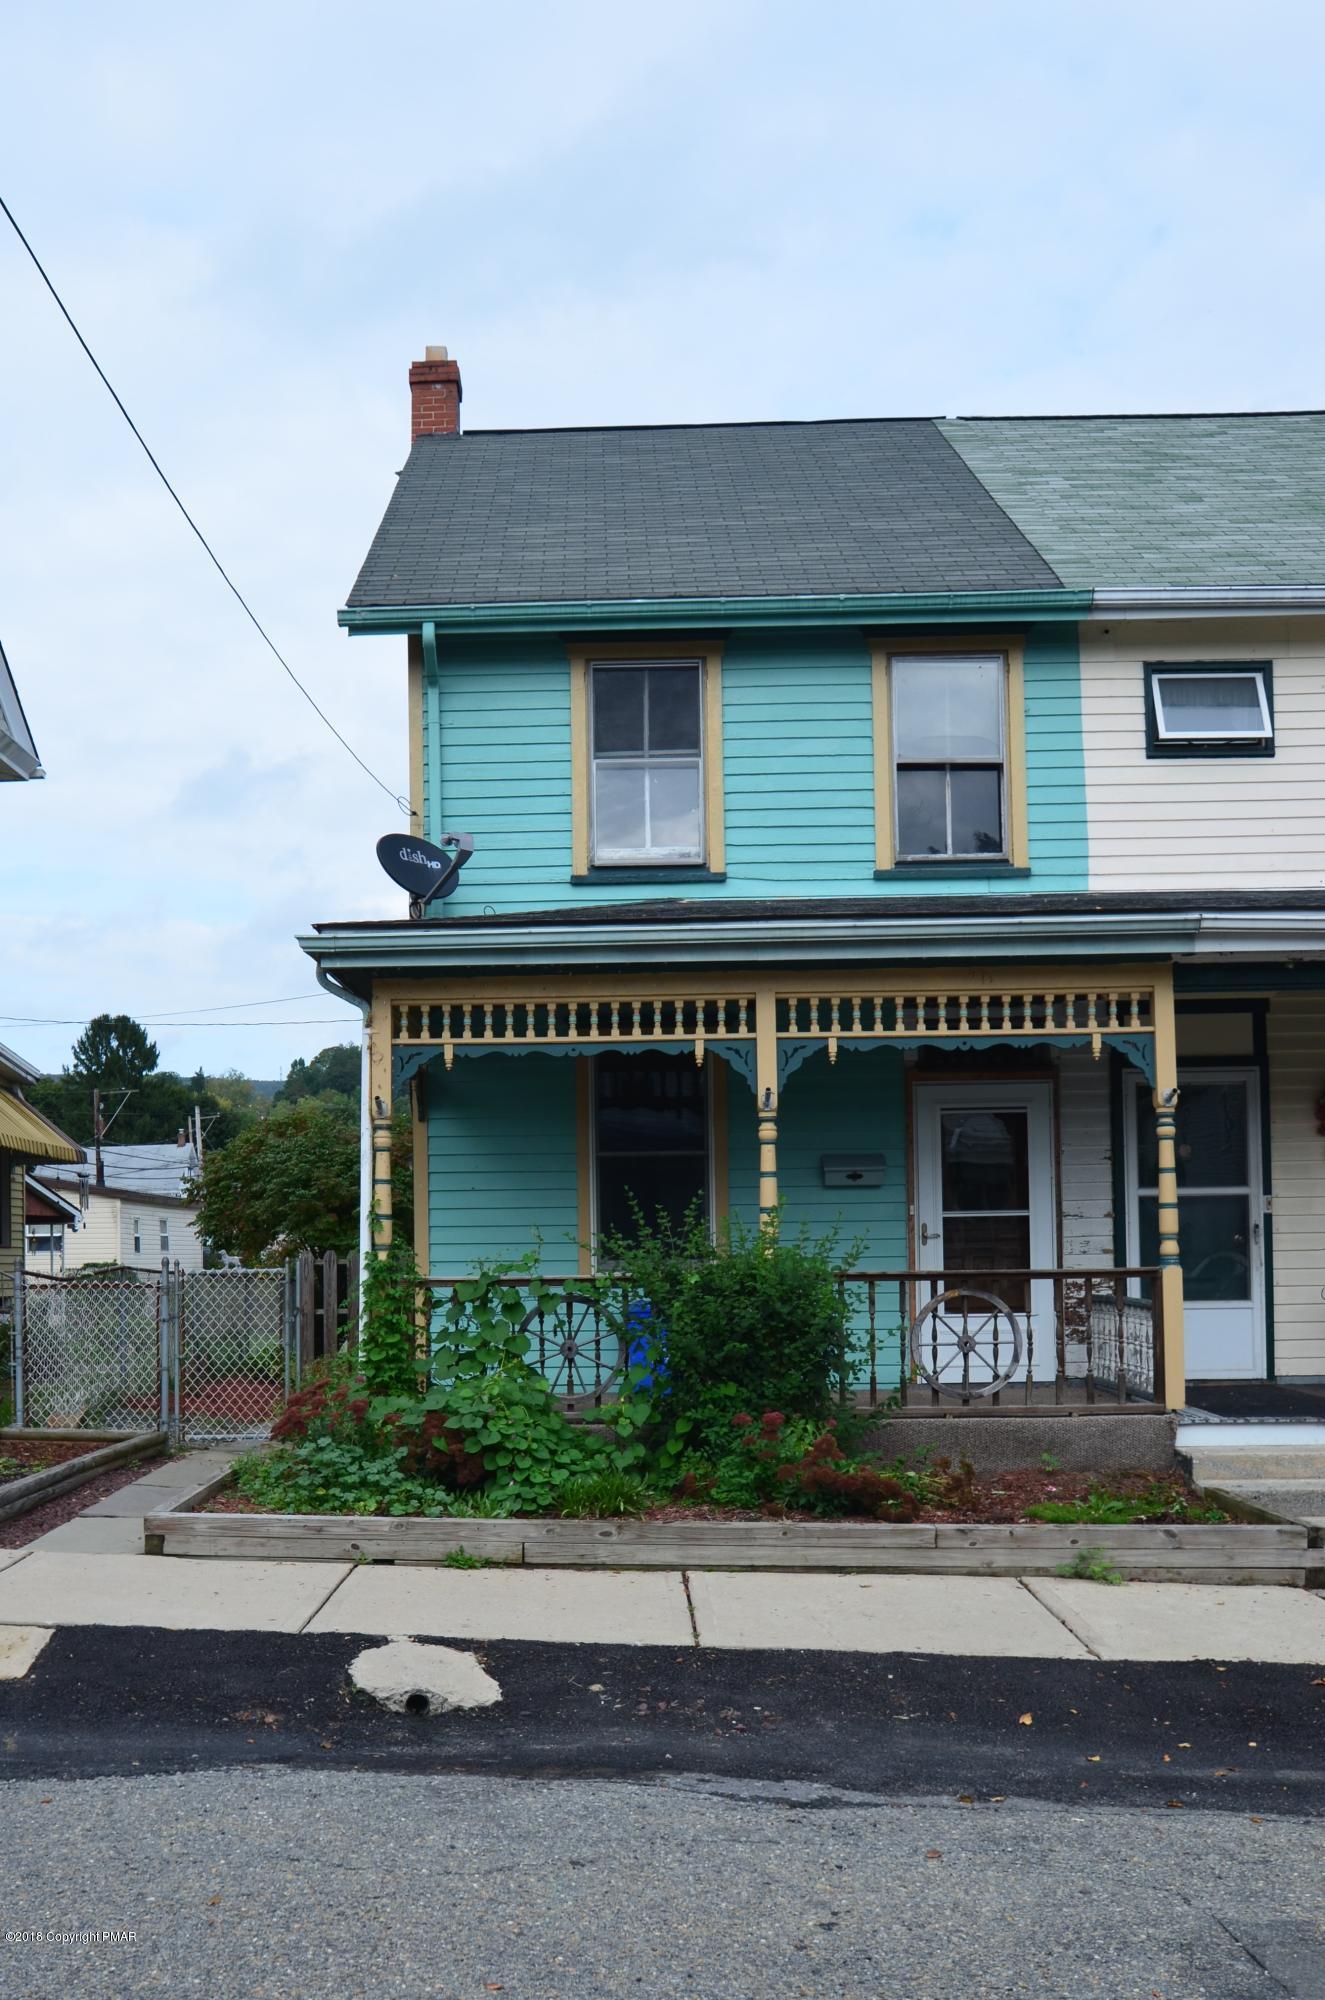 21 E Fourth St, Jim Thorpe, PA 18229